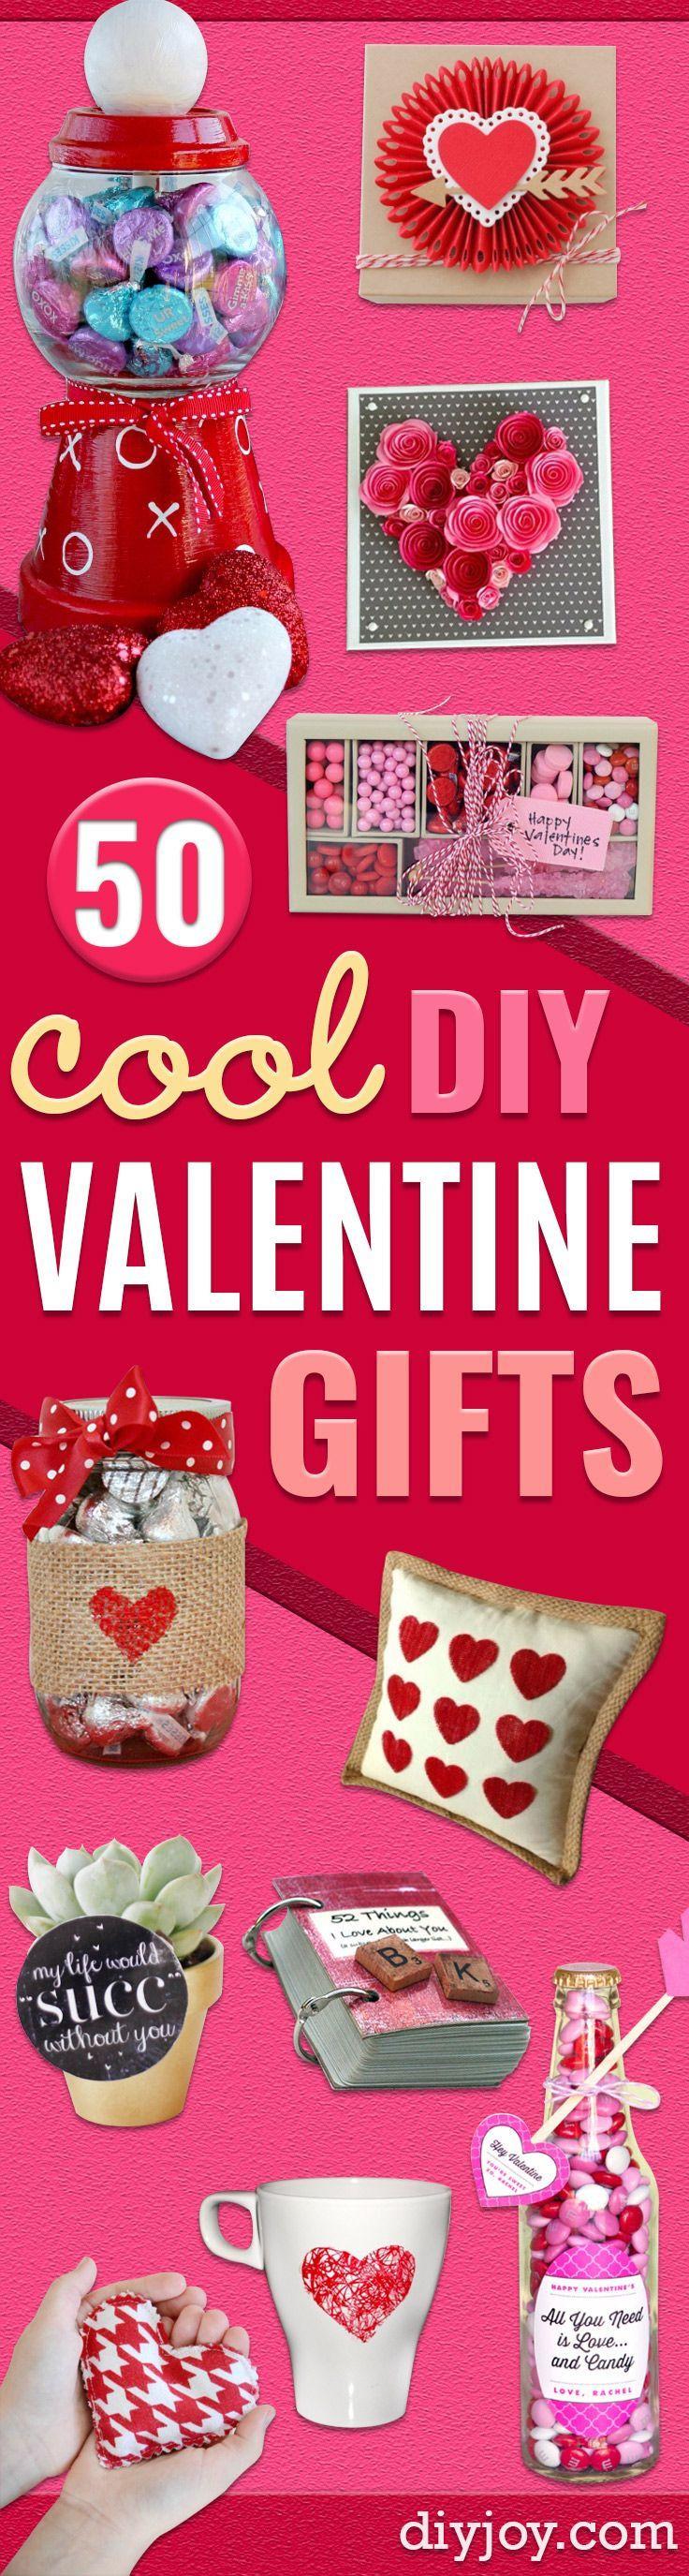 Valentine'S Day Gift Ideas For Girlfriend  1000 ideas about Teenage Boyfriend Gifts on Pinterest